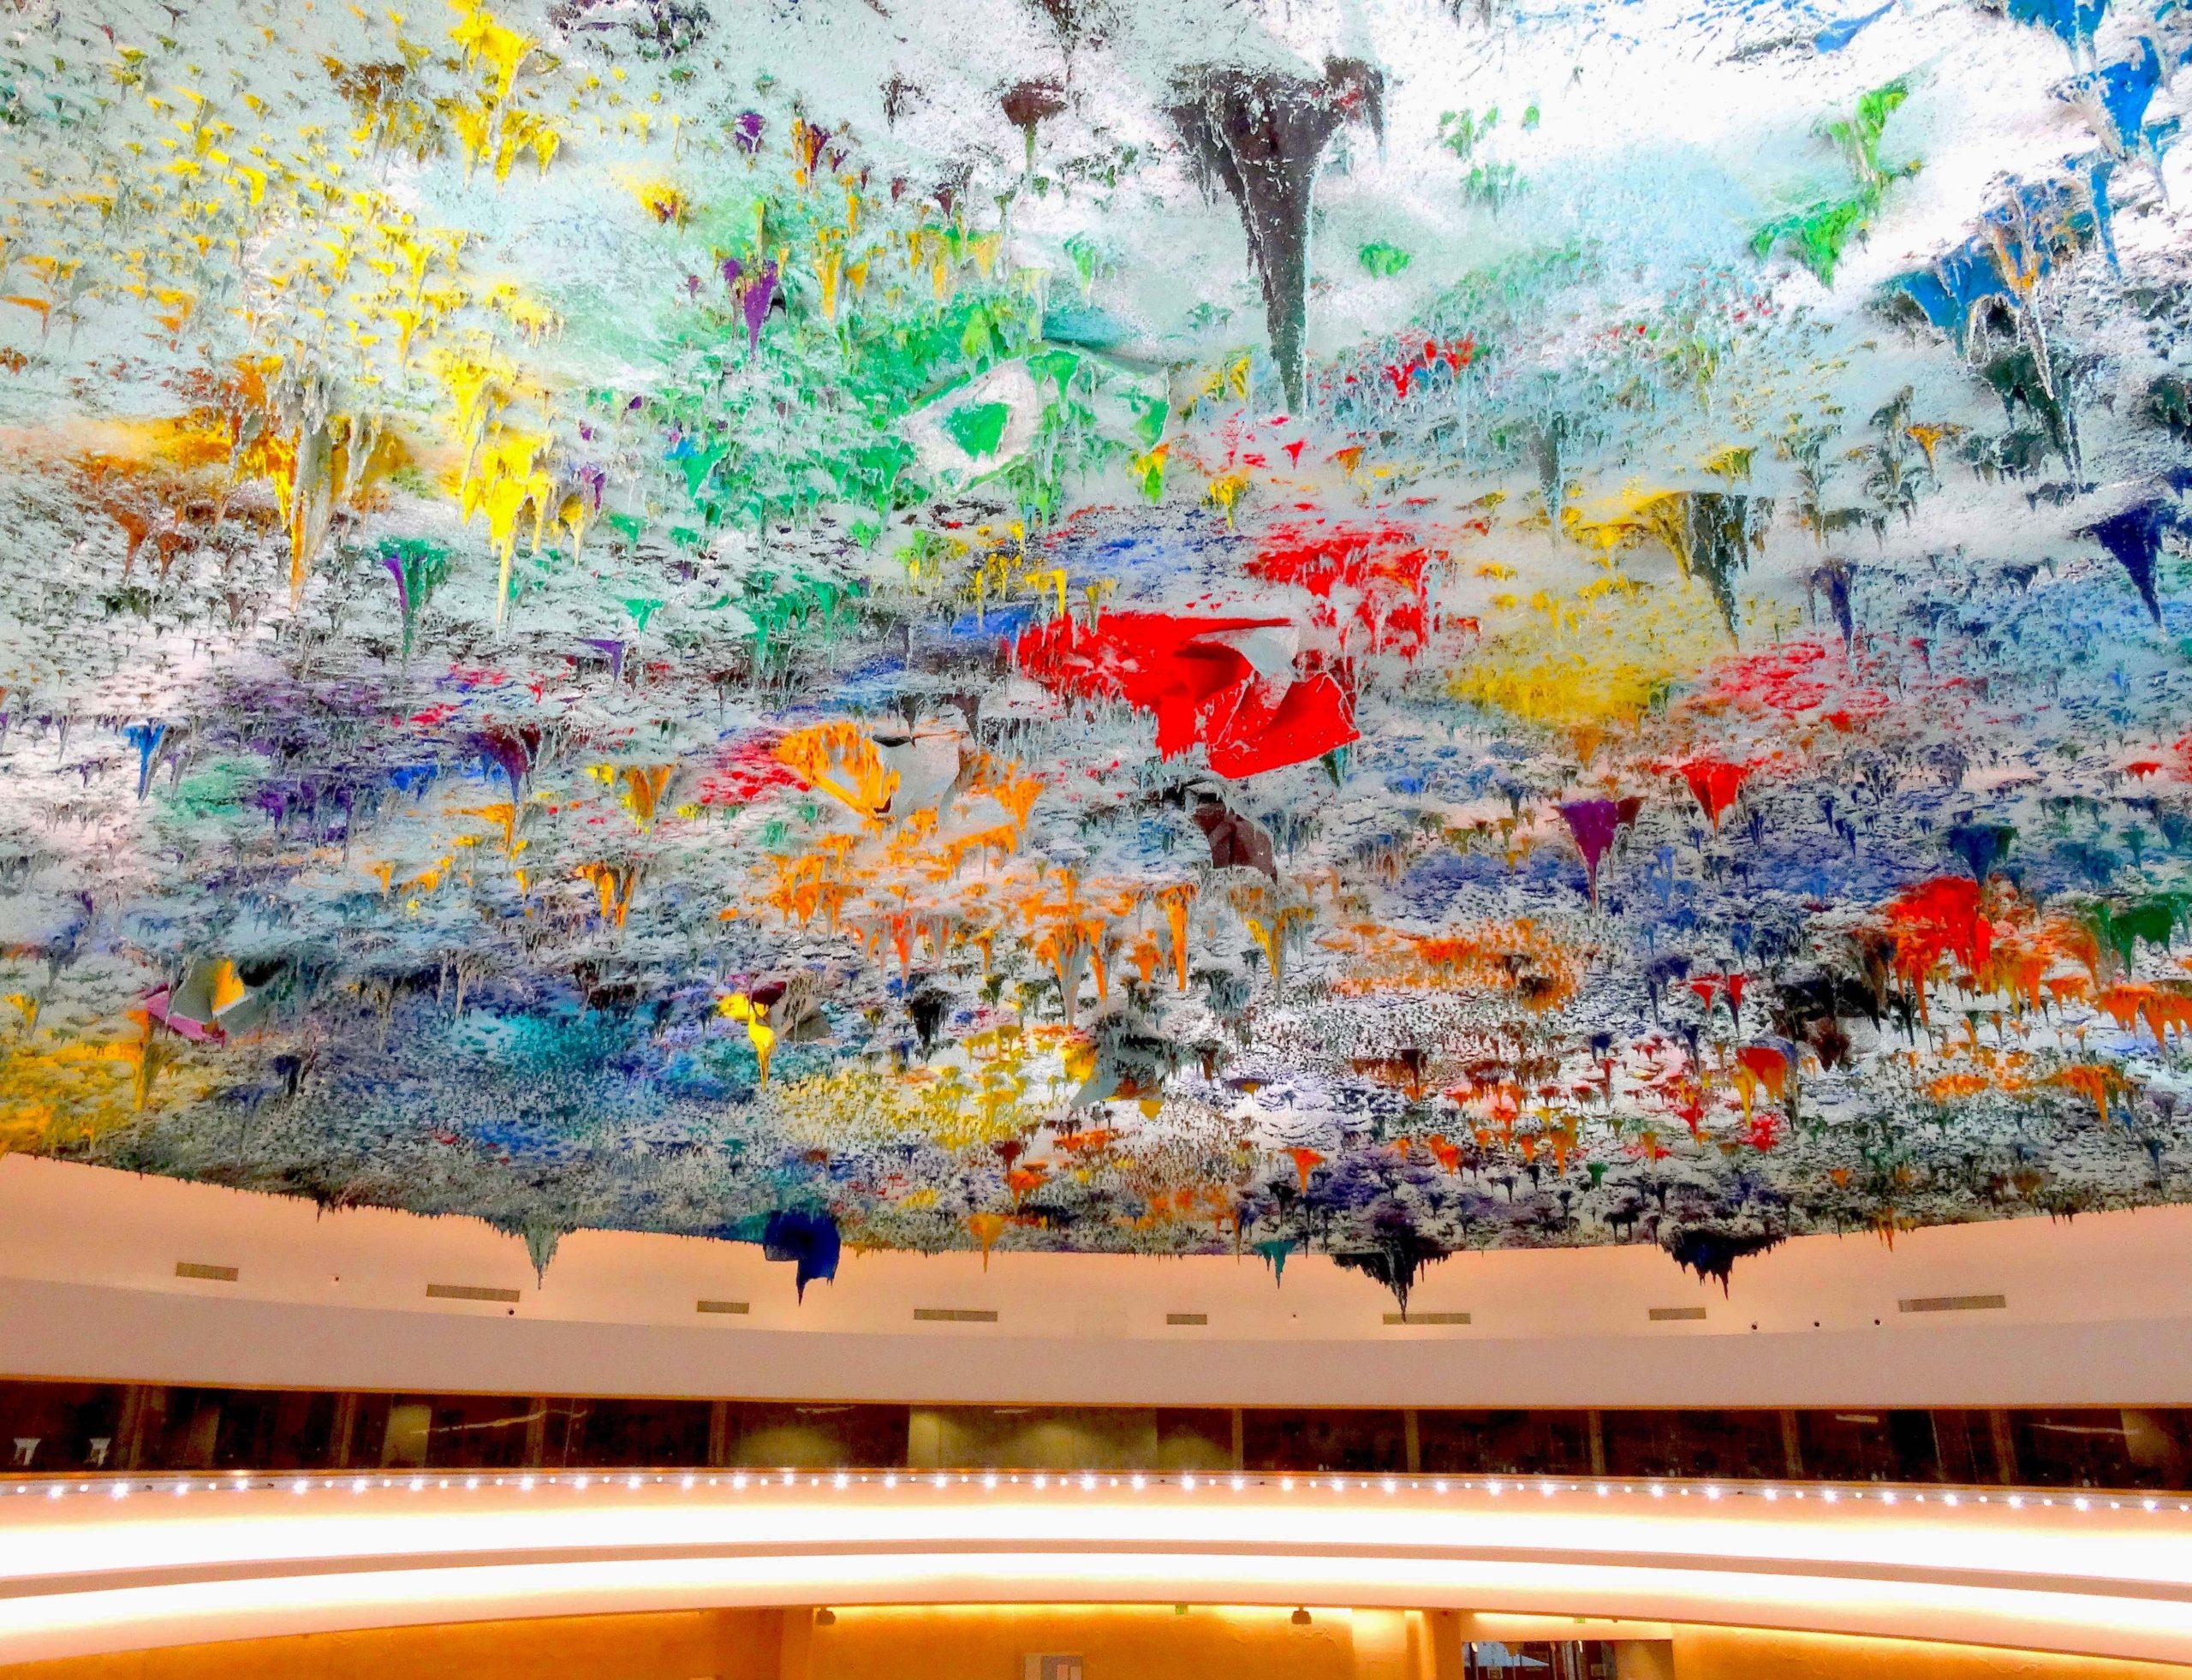 Human rights council chamber